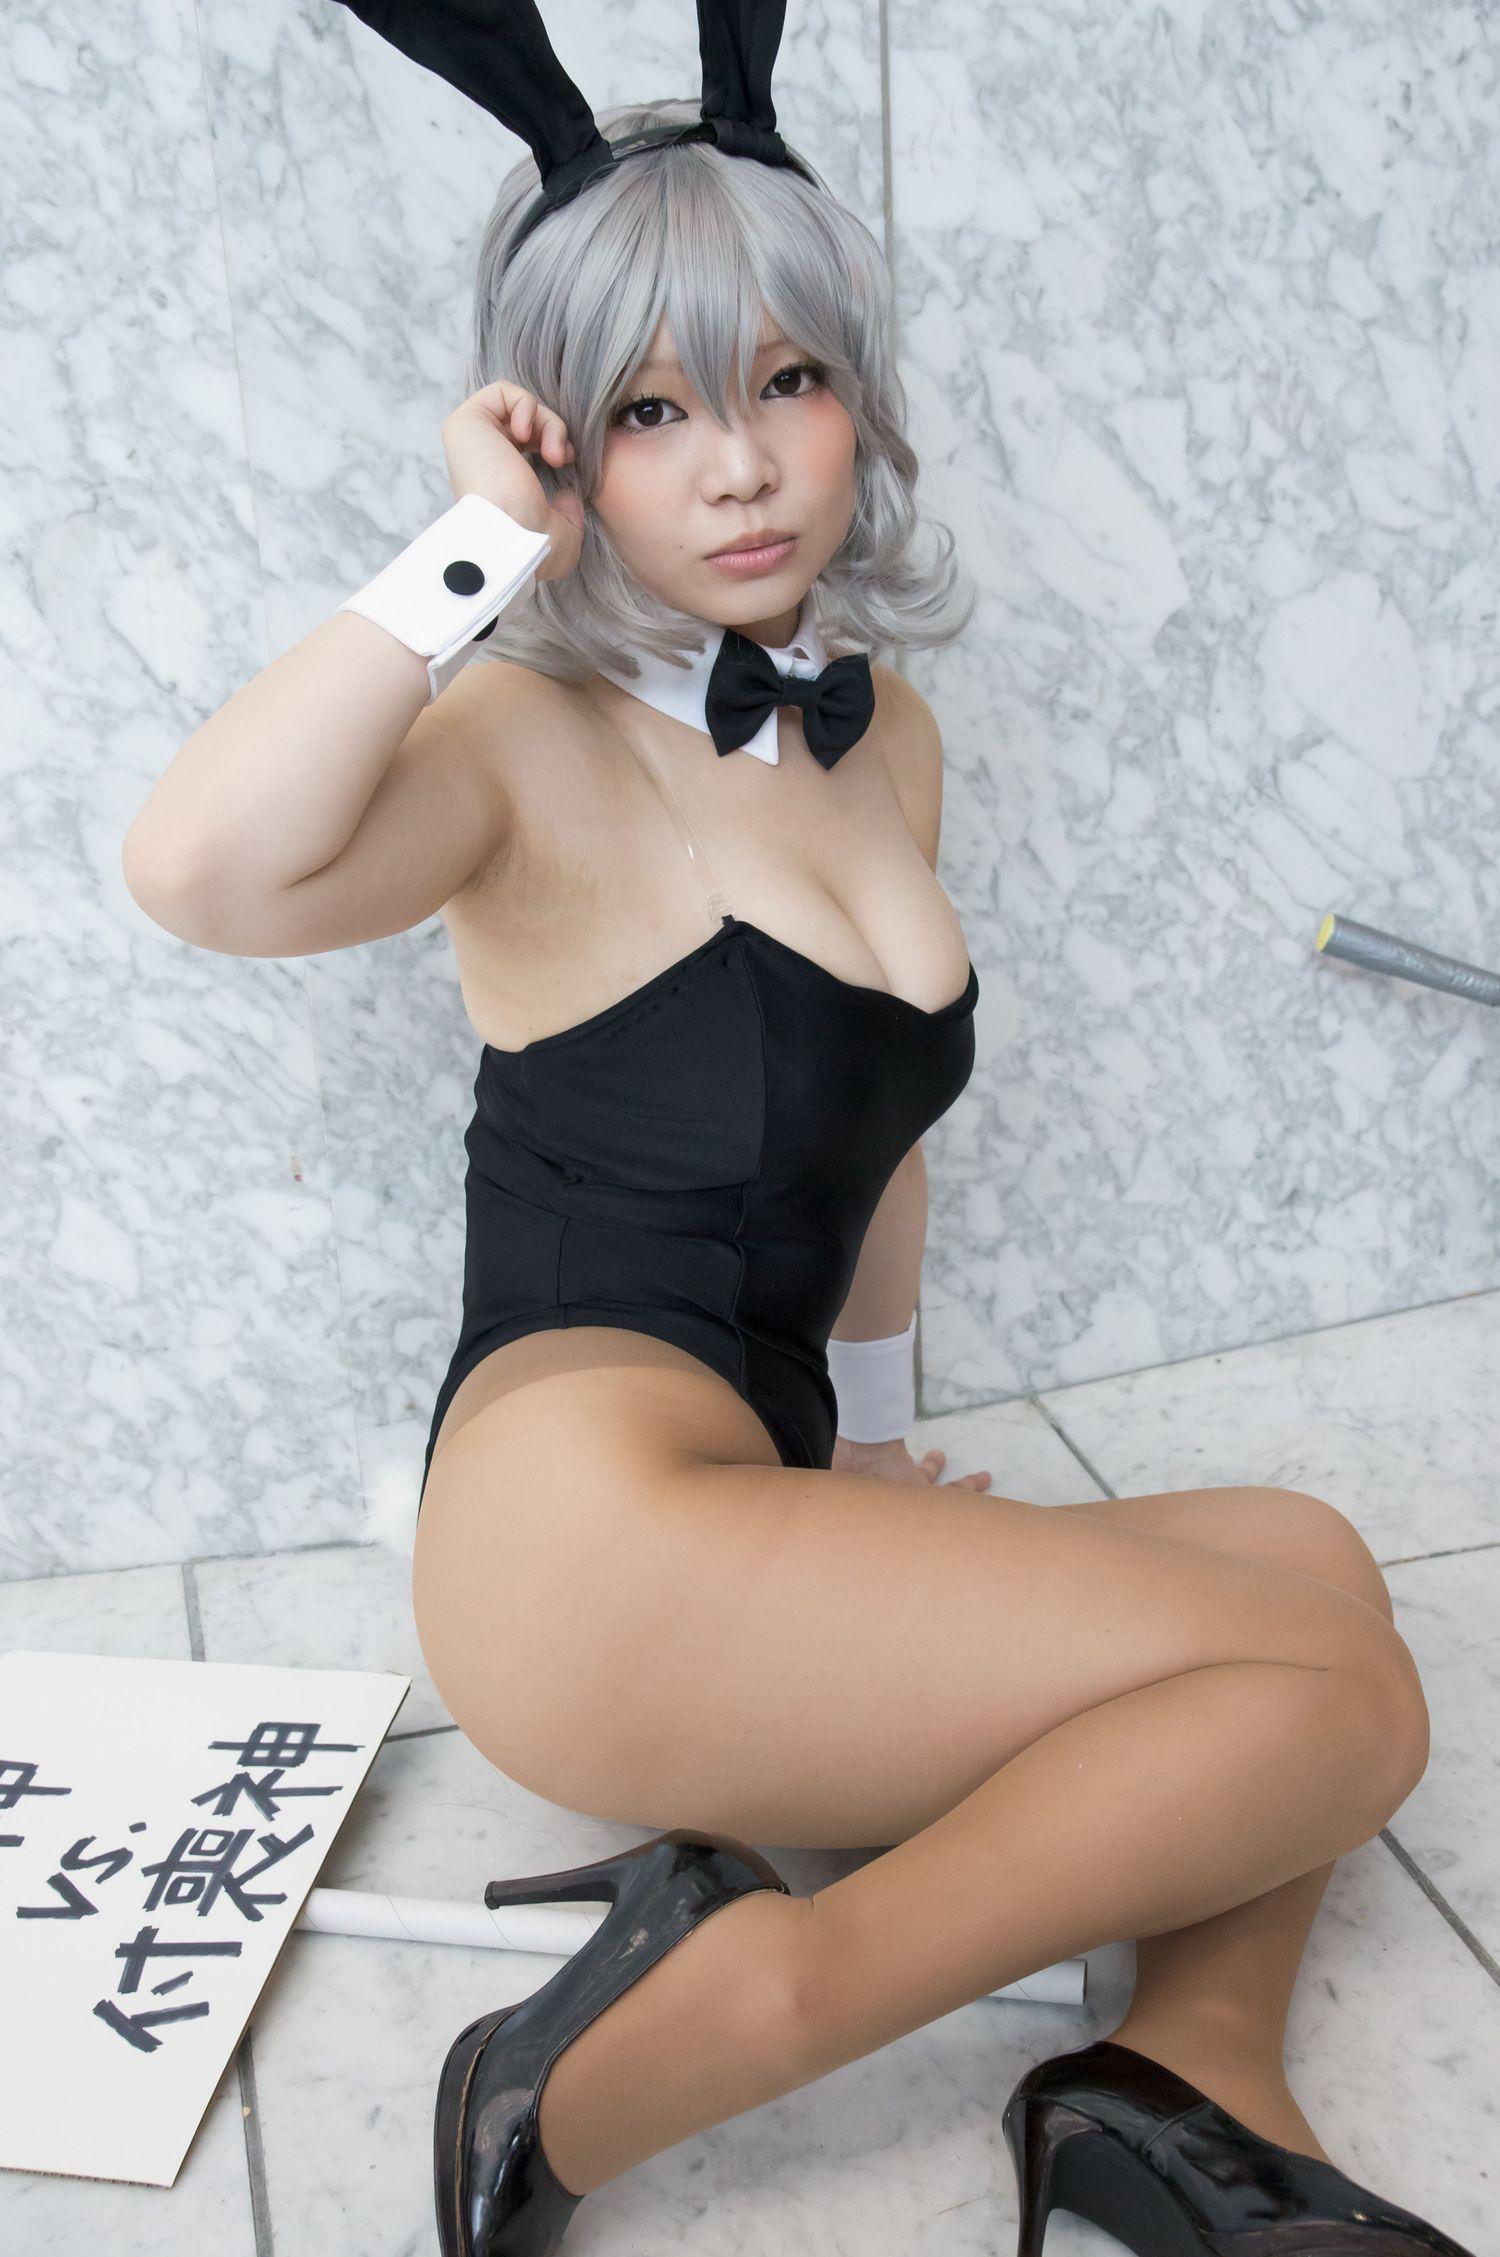 sexy school teacher clevage shots